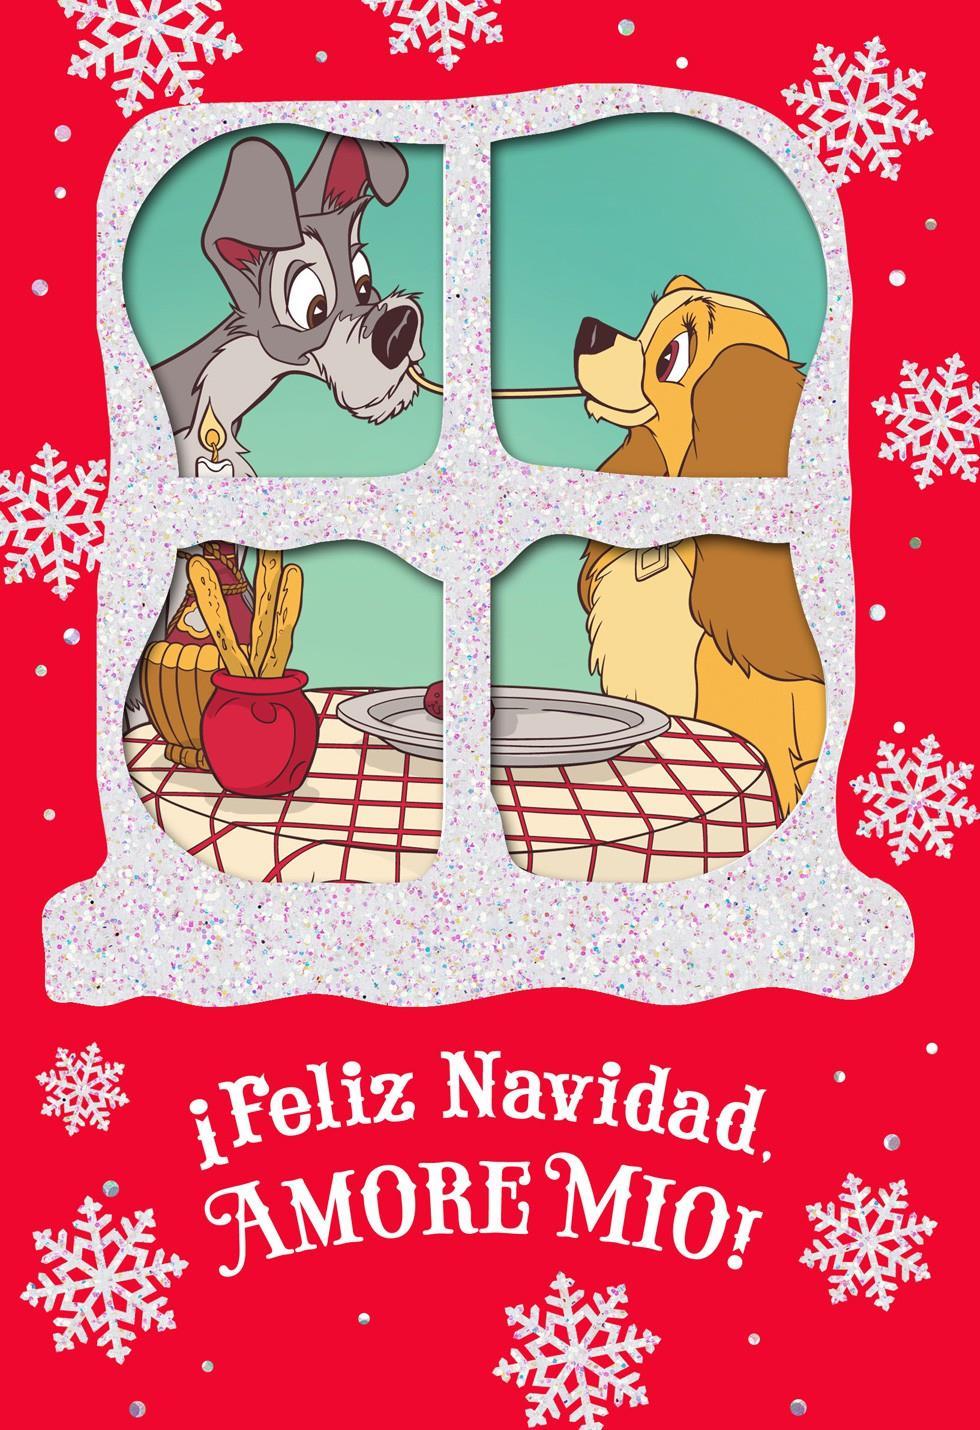 Christmas cards holiday greeting cards hallmark lady and the tramp feliz navidad christmas card kristyandbryce Choice Image